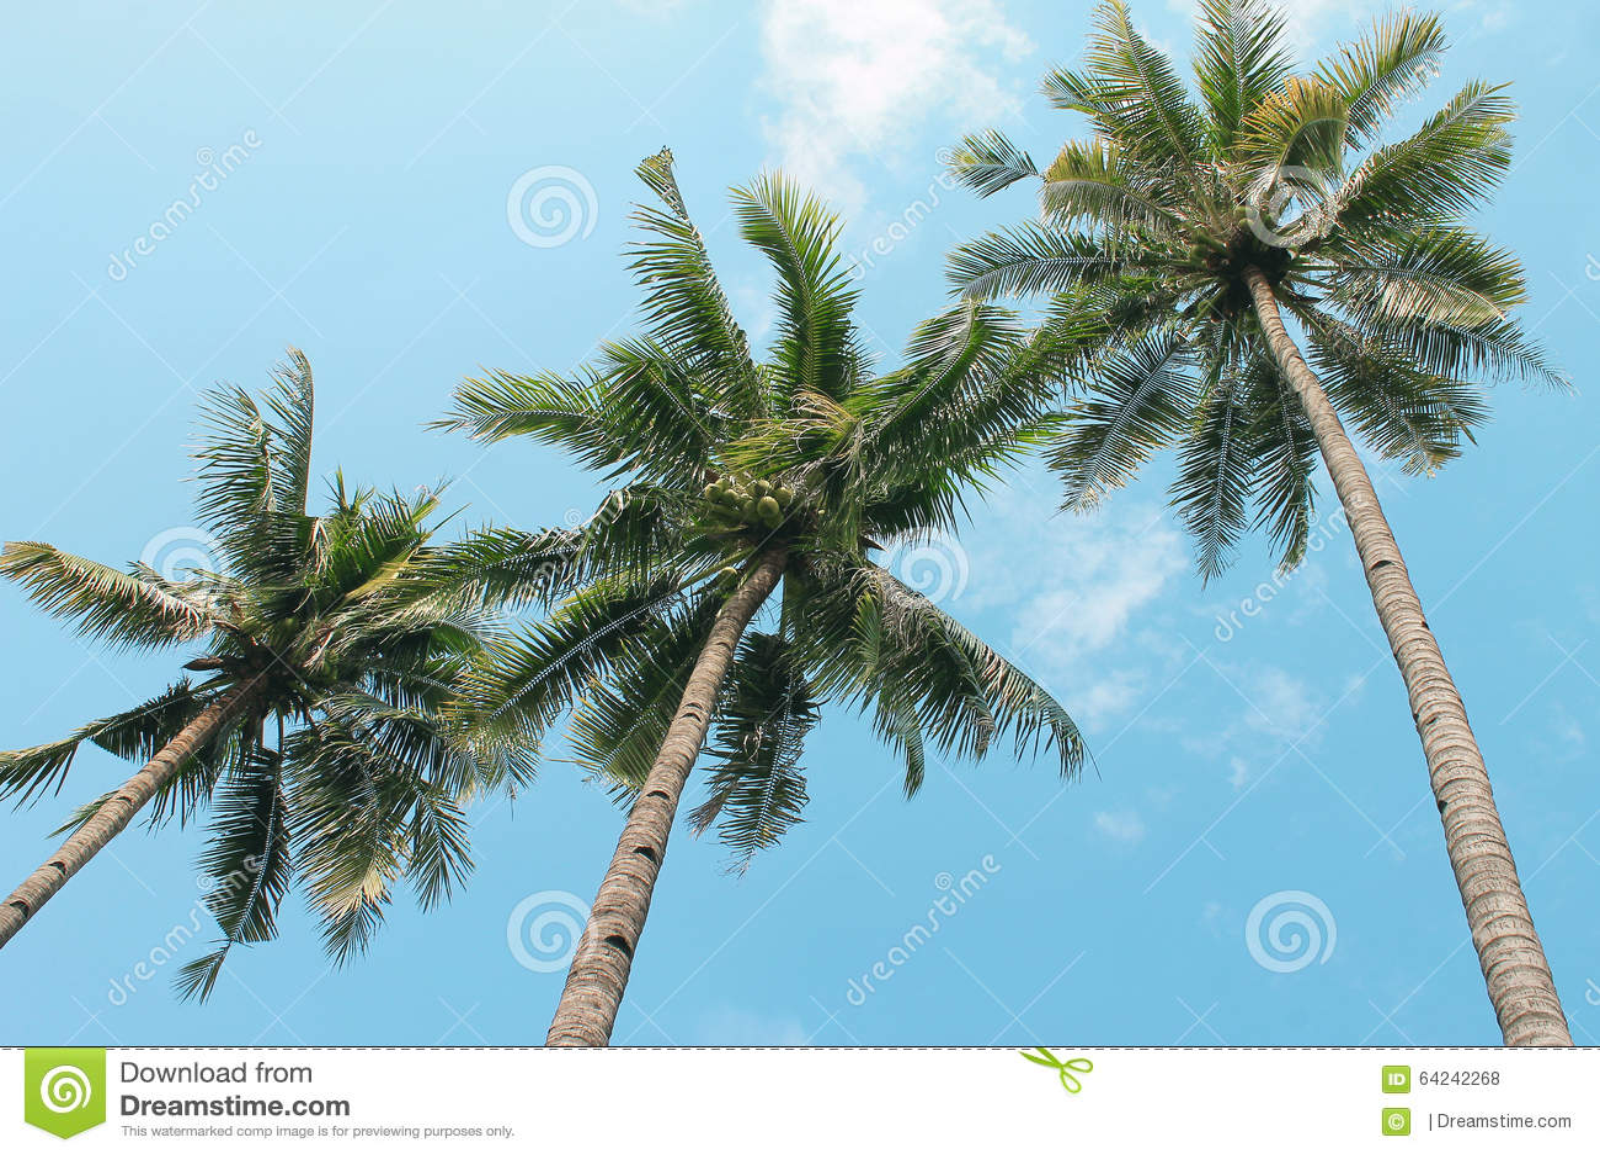 Arbre de noix de coco photo stock image 64242268 - Arbre noix de coco ...